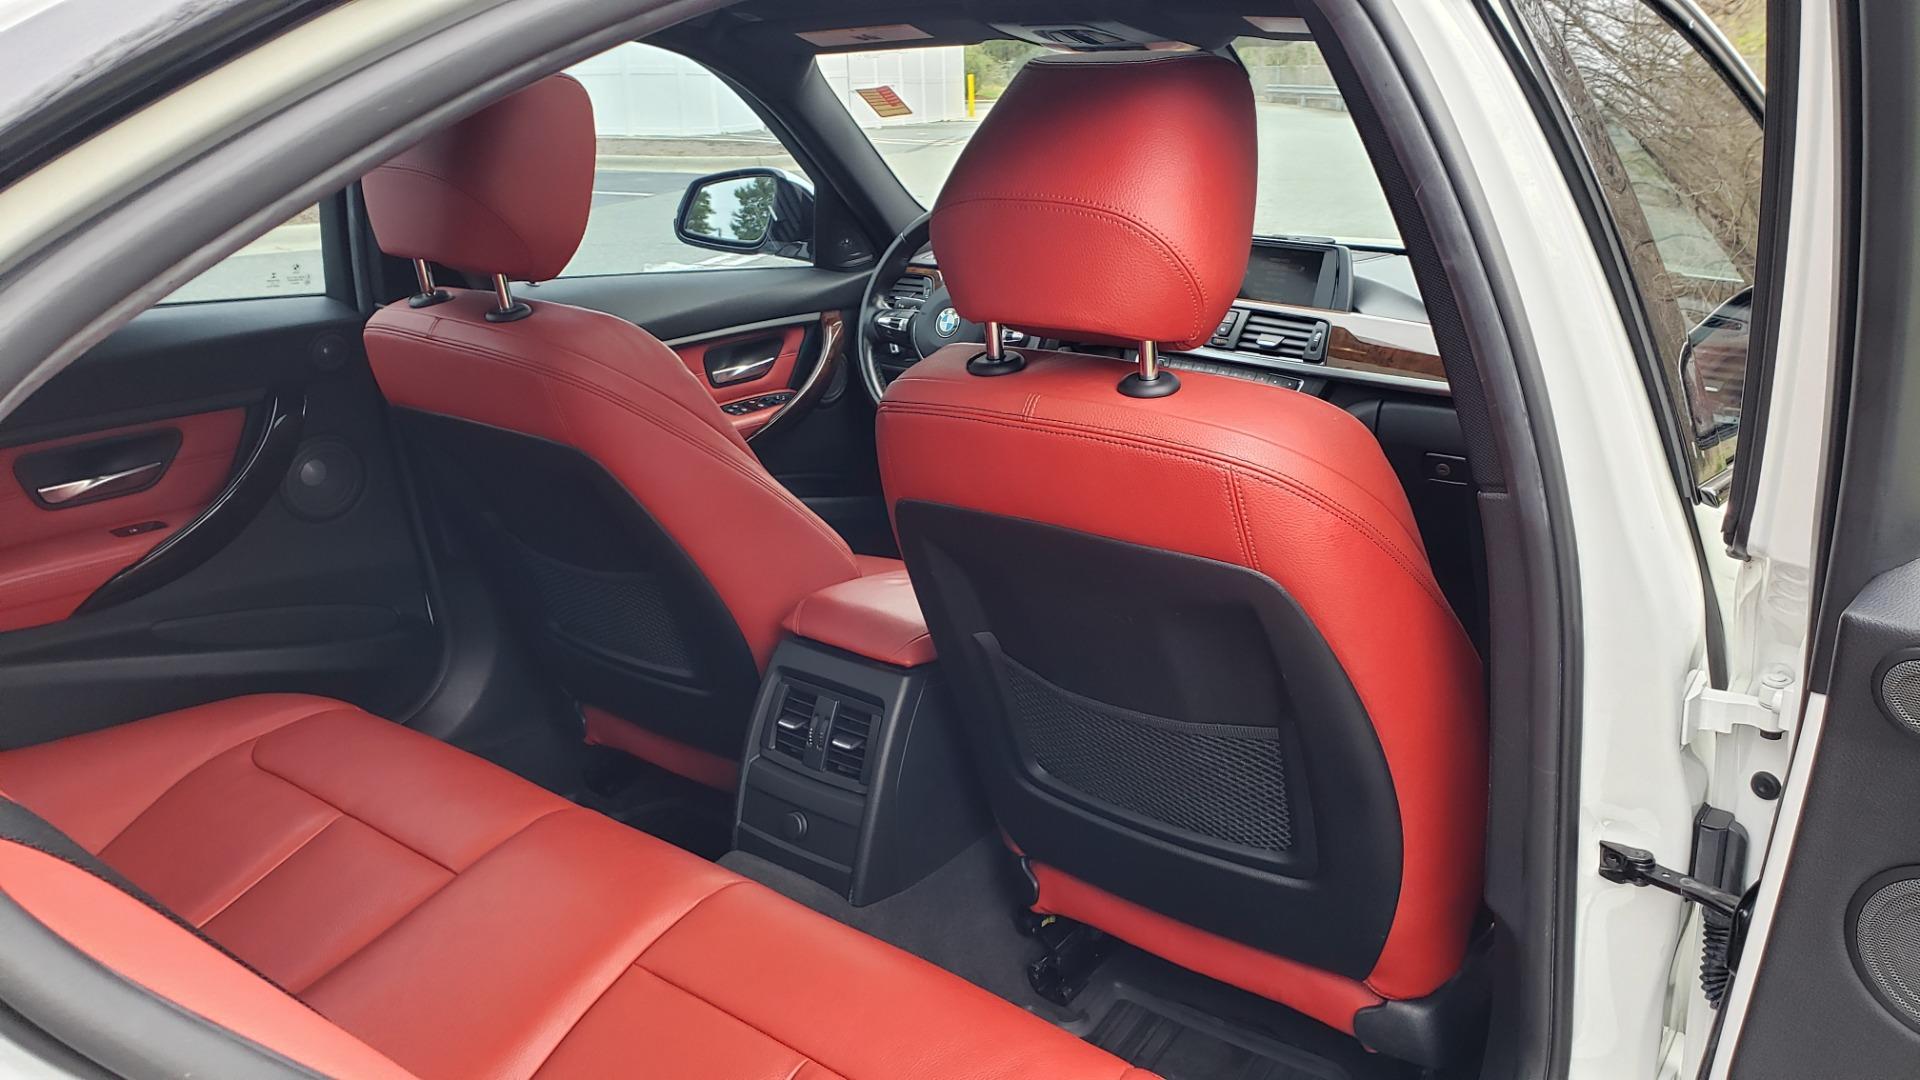 Used 2015 BMW 3 Series 335I M-SPORT / PREM PKG / HK SND / SUNROOF / REARVIEW for sale Sold at Formula Imports in Charlotte NC 28227 74